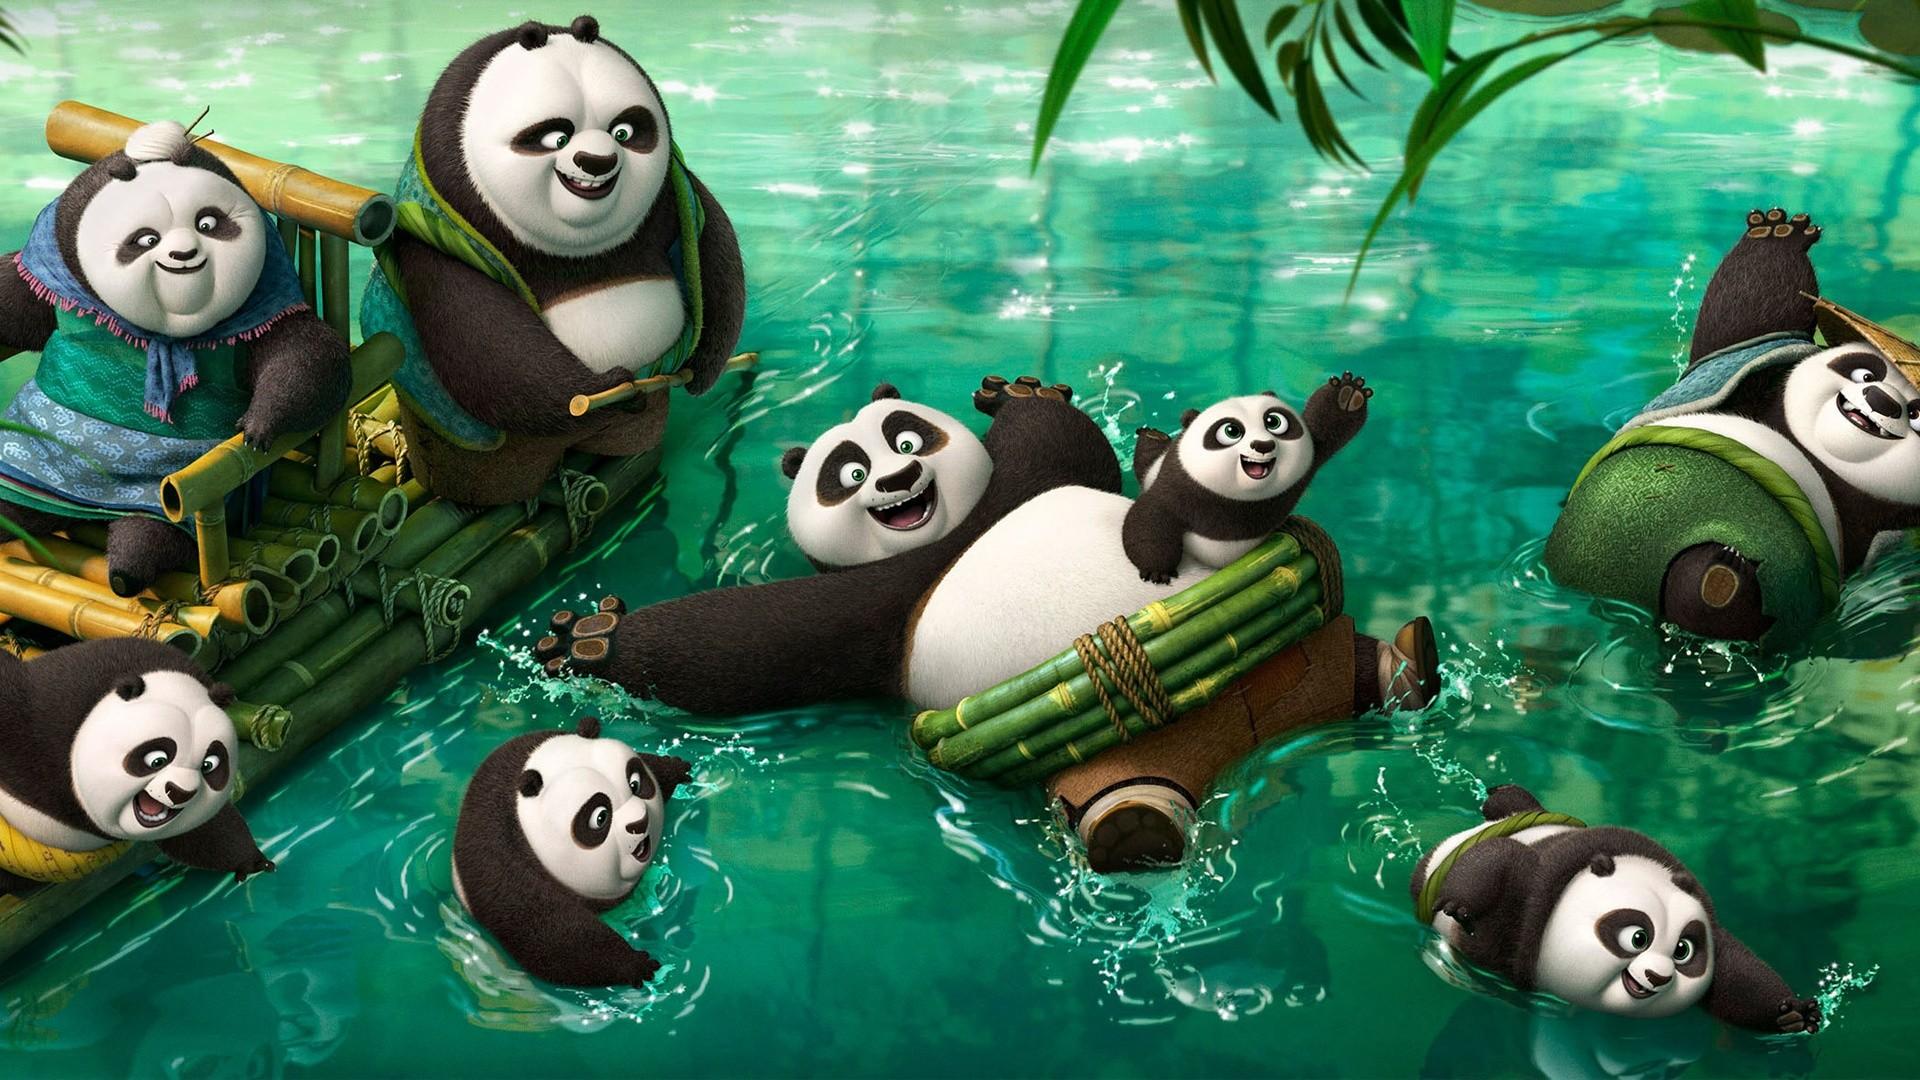 Kung Fu Panda Wallpapers HD Wallpapers Download